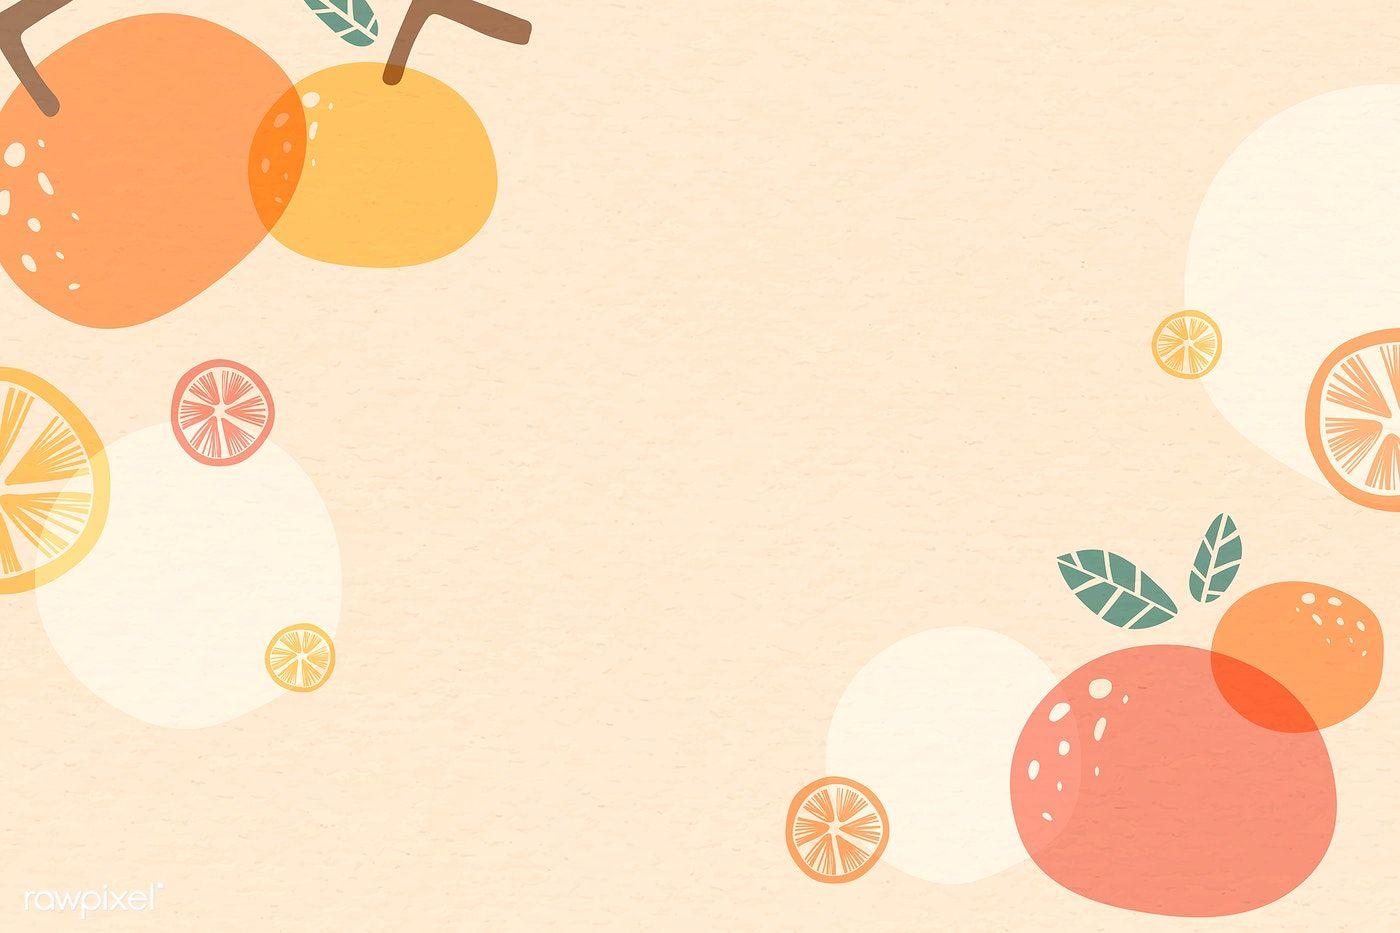 Download Premium Vector Of Orange Patterned Background With Design Space Powerpoint Background Design Floral Prints Art Aesthetic Desktop Wallpaper